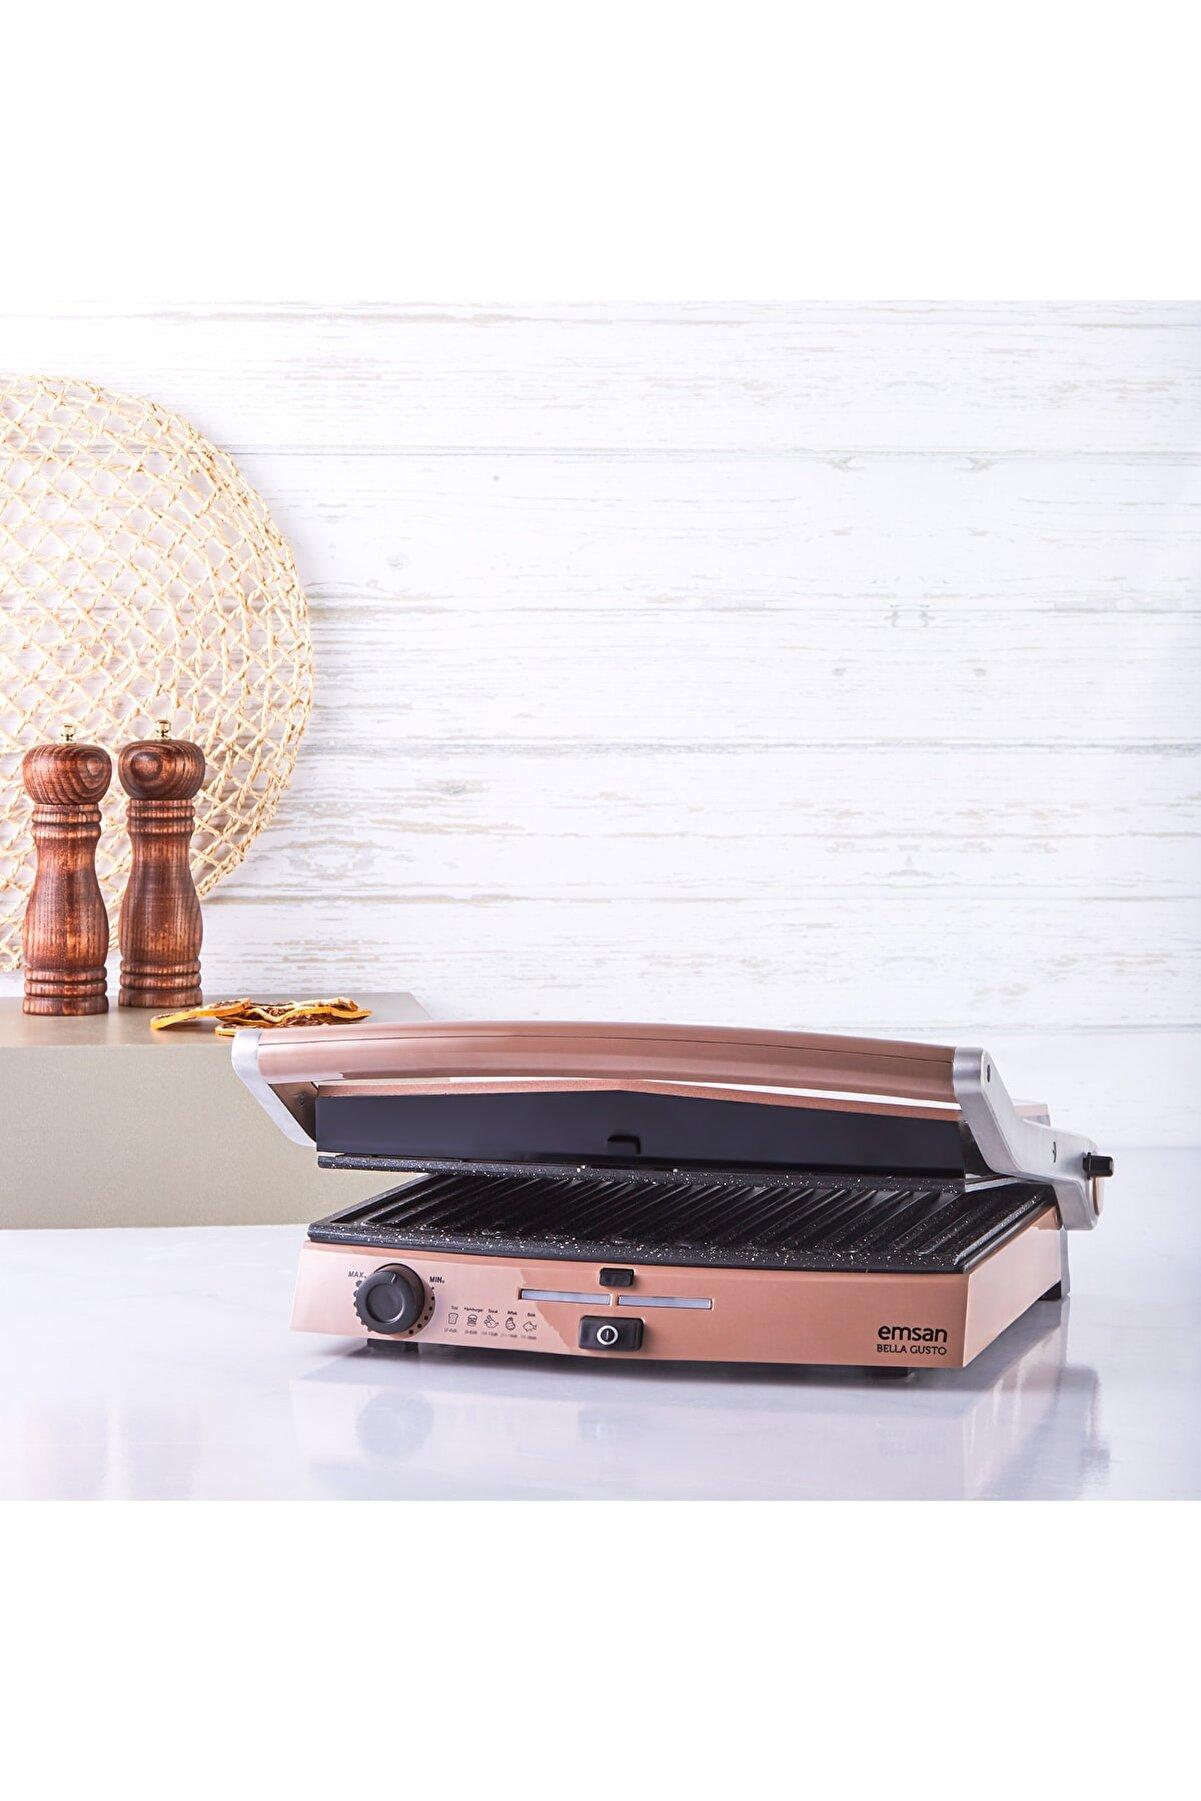 Emsan Bella Gusto 6 Dilim Ekmek Kapasiteli Tost Makinesi Golden Pink